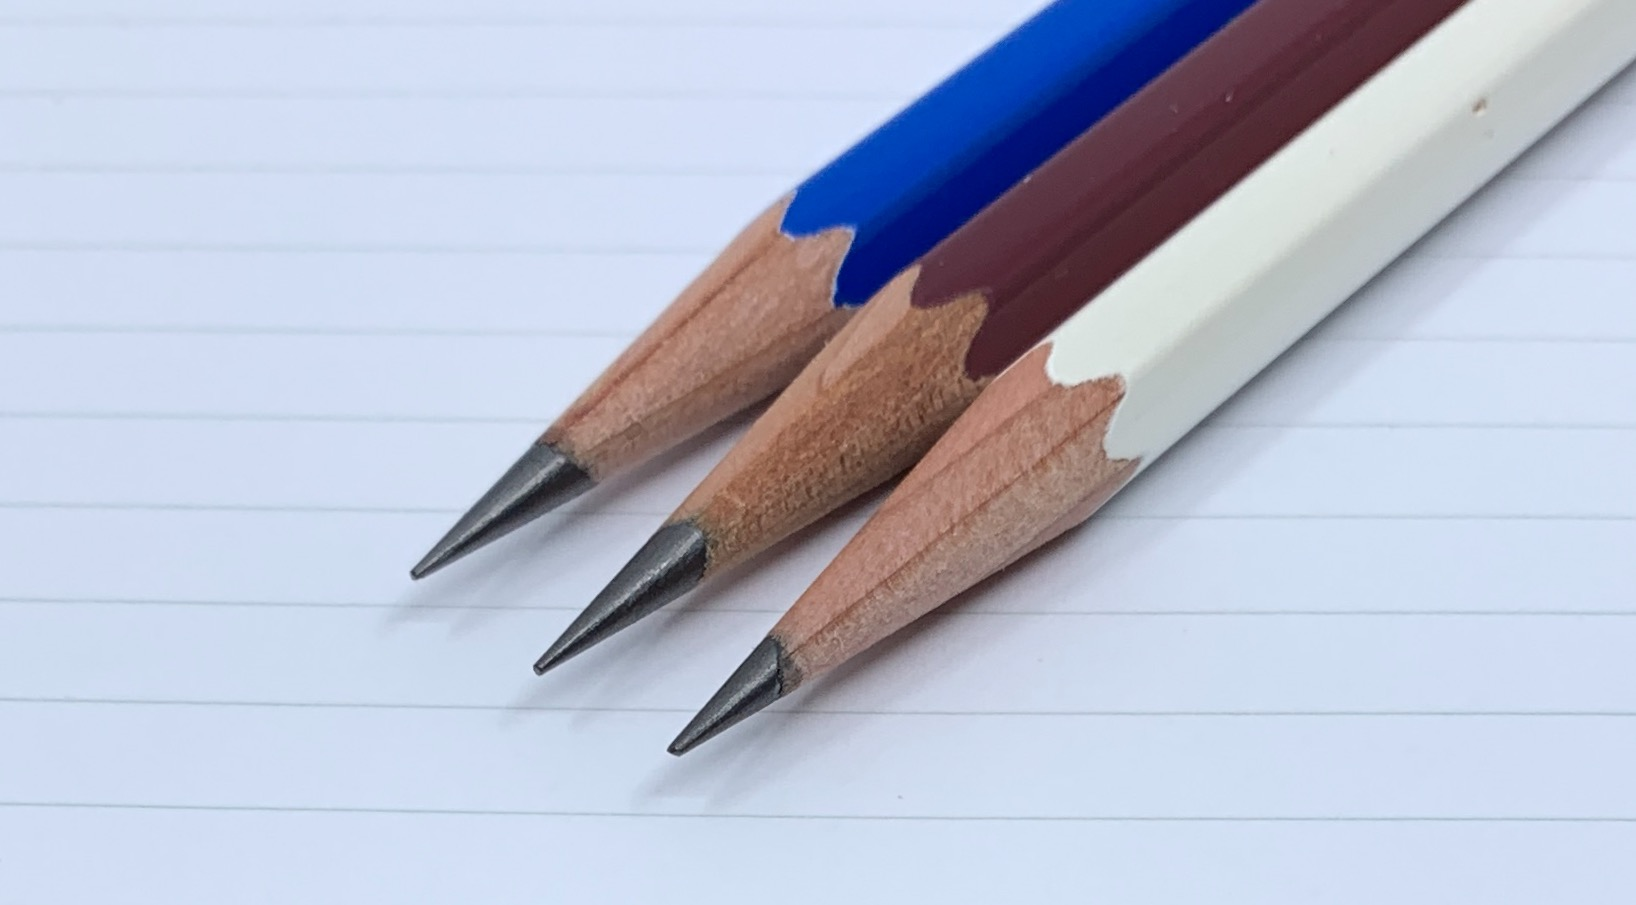 Tombow Mono KM-KKS 4B Pencils